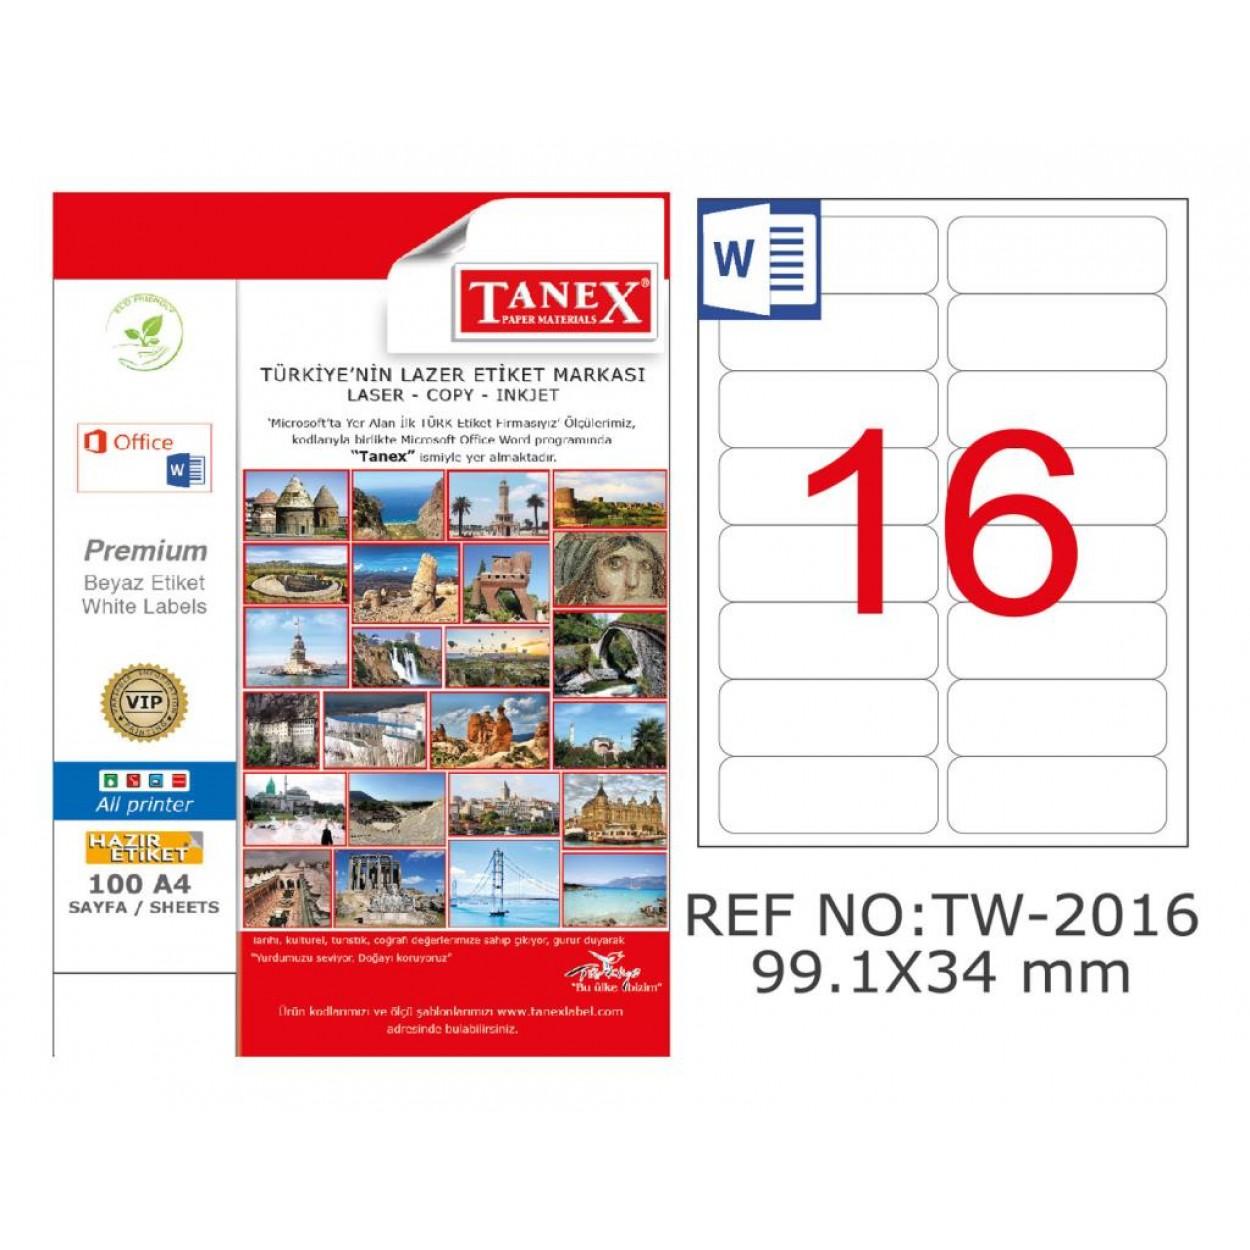 Tanex TW-2016 99.1x34mm Şeffaf Laser Etiket 400 Lü